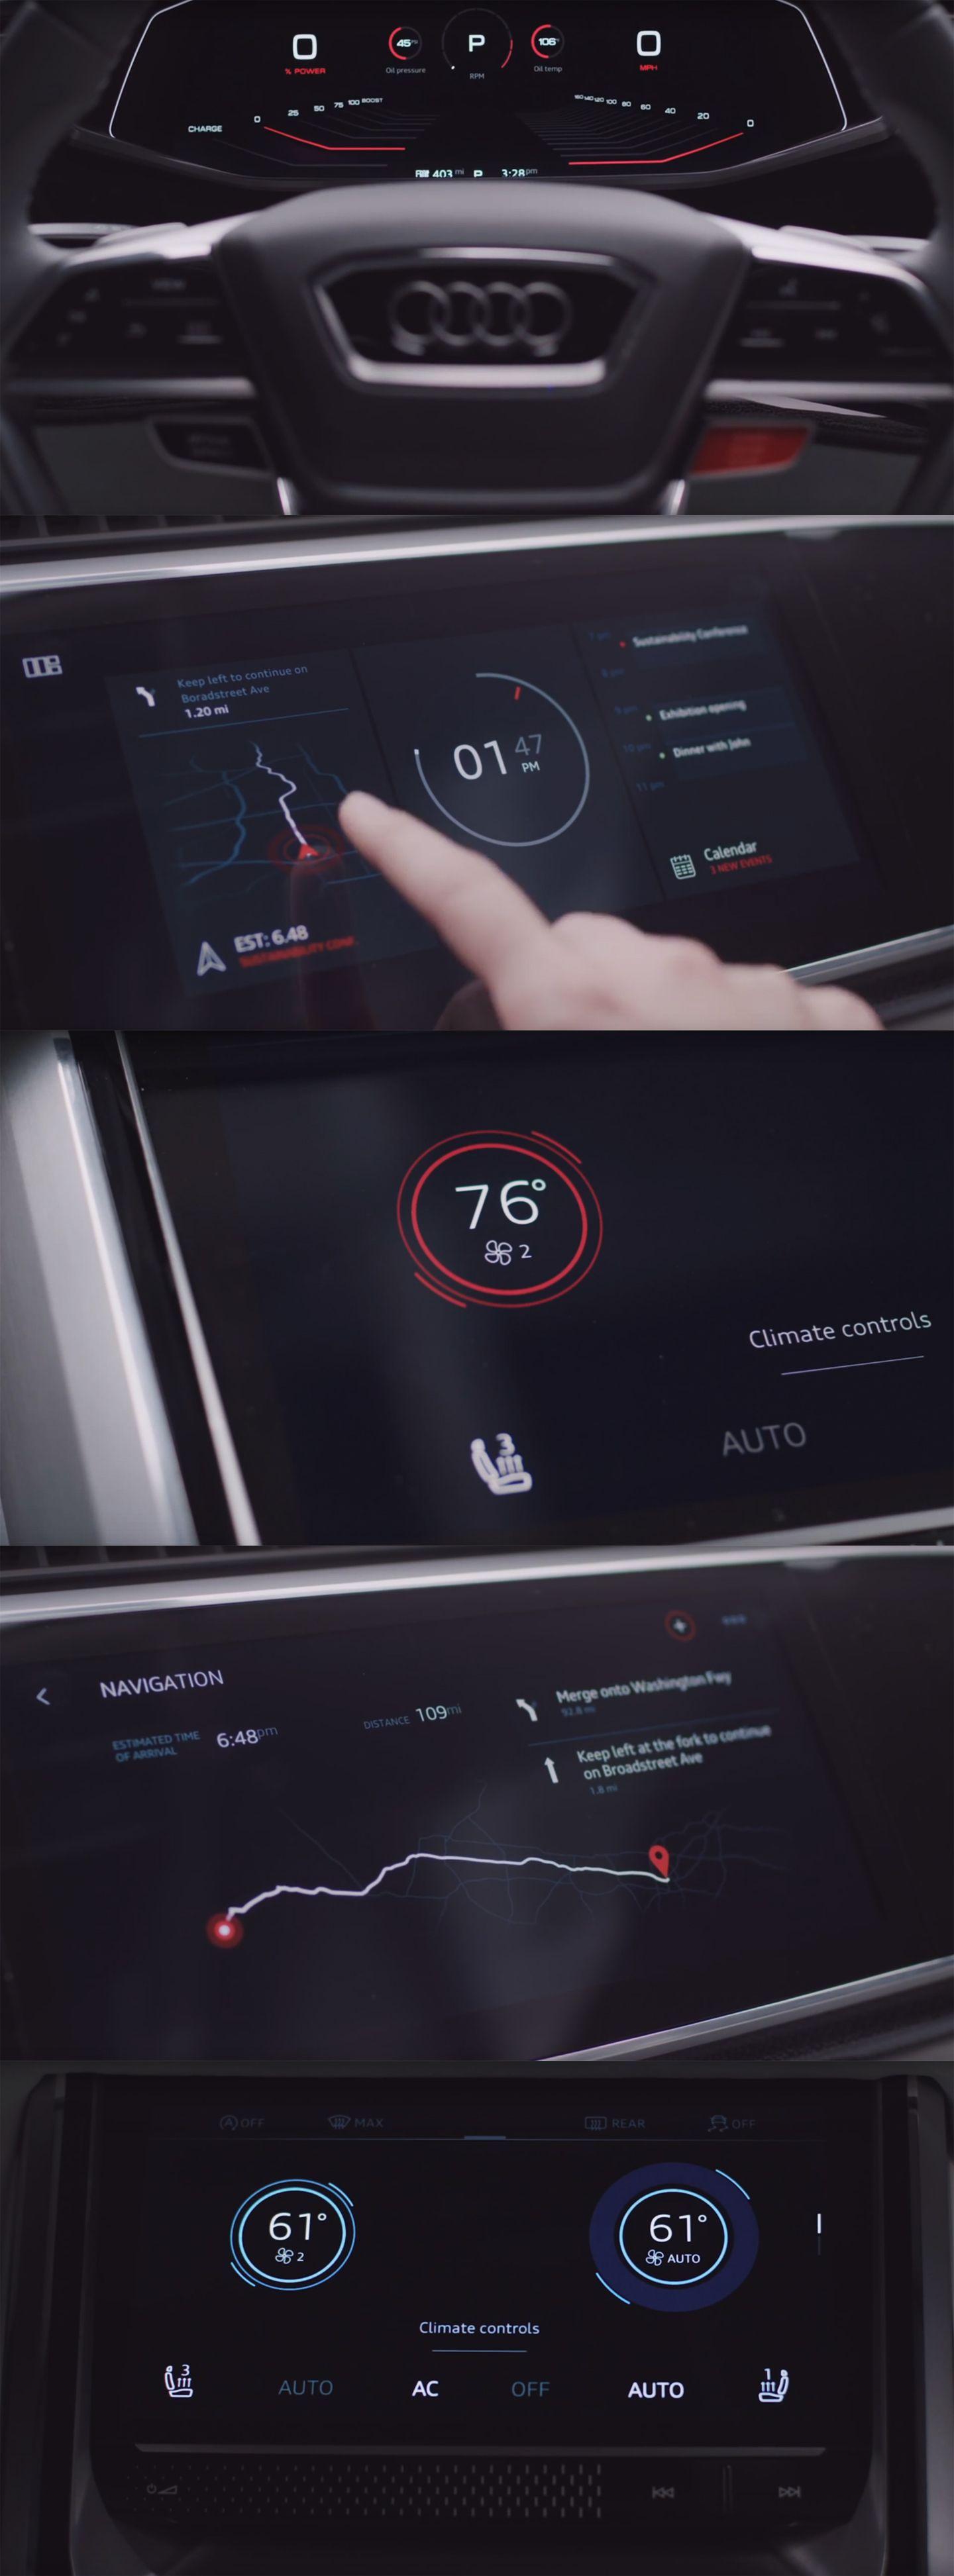 Audi Q8 Concept 2017 UI/UX https://www.youtube.com/watch?v=uTZ0ZABOIbA